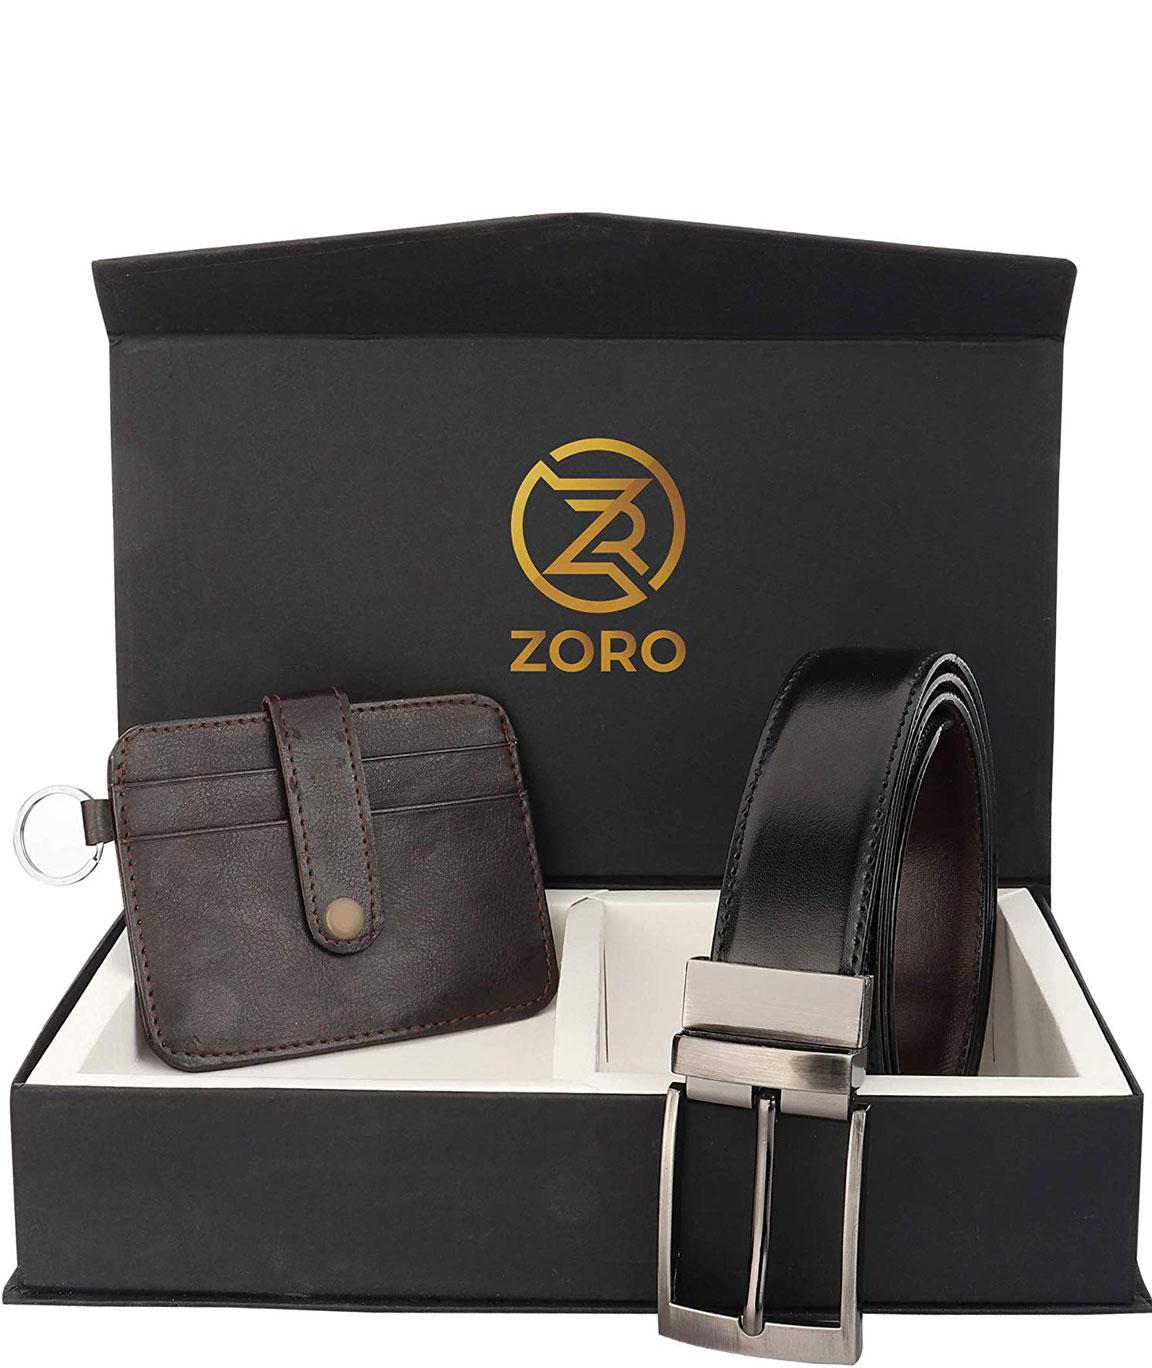 ZORO Reversible PU belt and wallet combo, formal black and brown reversible belt, gift for mens, gents belt, mens wallet ZR-TX01-41R